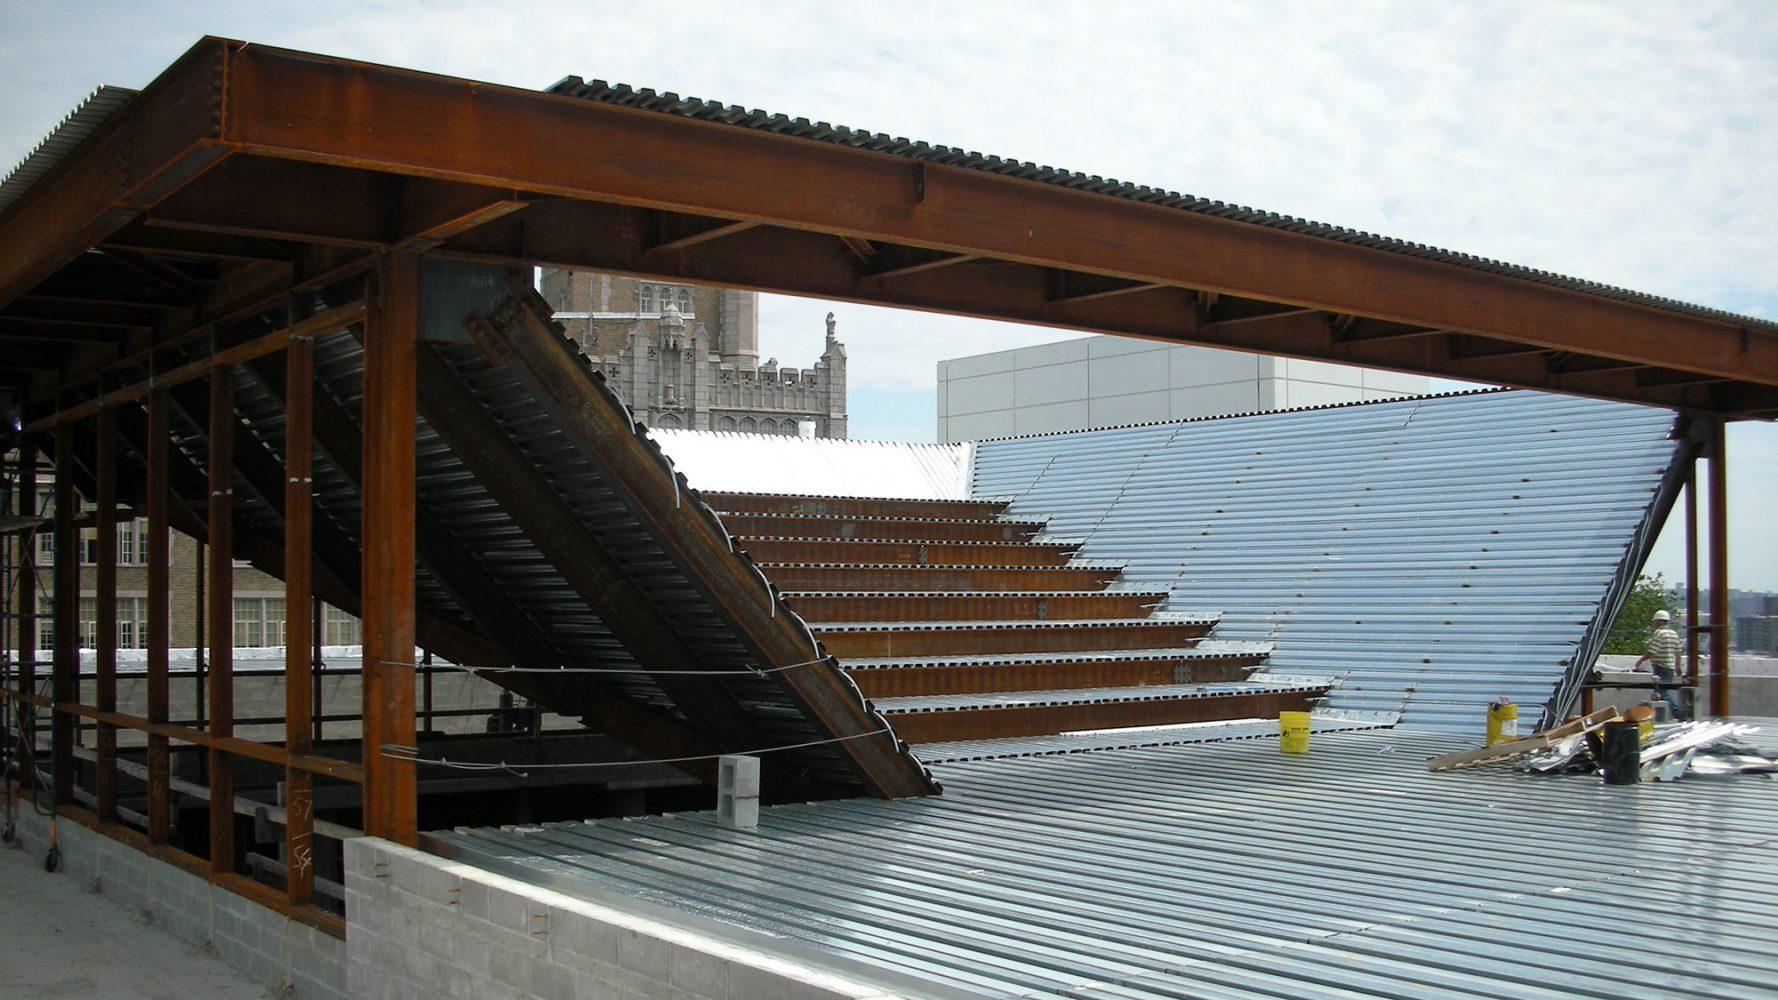 Ccny Architecture: 纽约城市学院Spitzer建筑学院 - Rafael